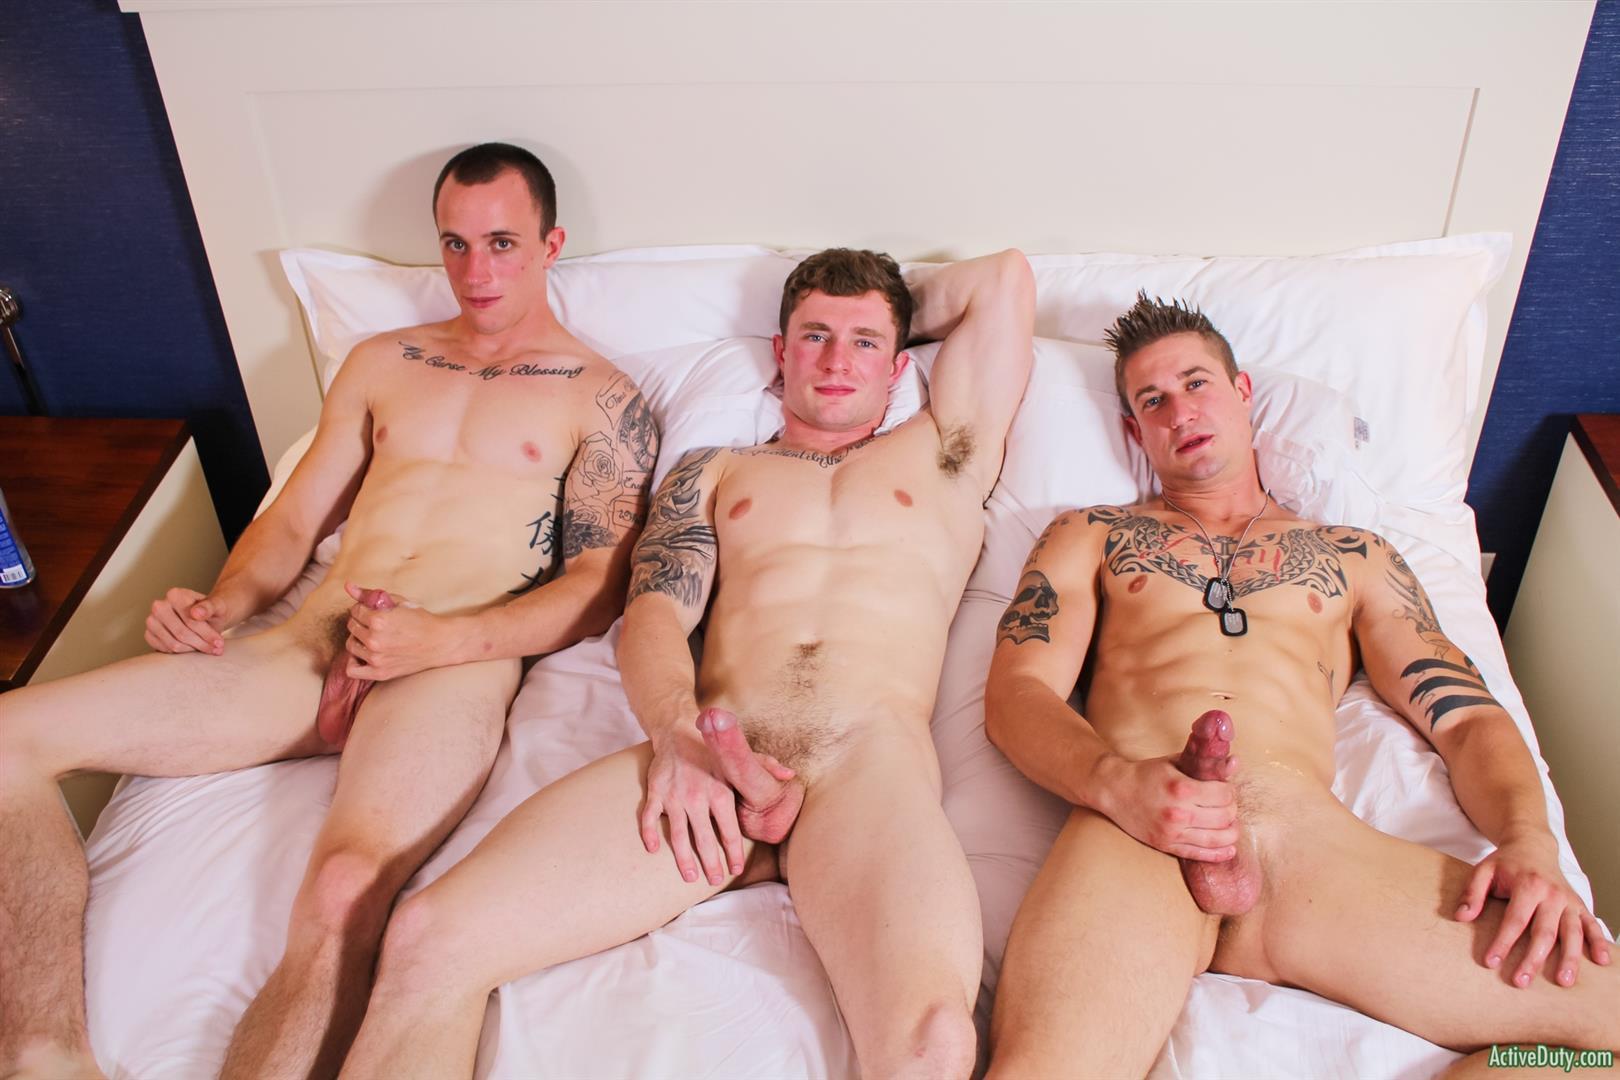 Active-Duty-Threeway-Army-Guys-Bareback-Sex-Video-Amateur-Gay-Porn-15 Big Dick Muscular Army Guys In A Bareback Threeway